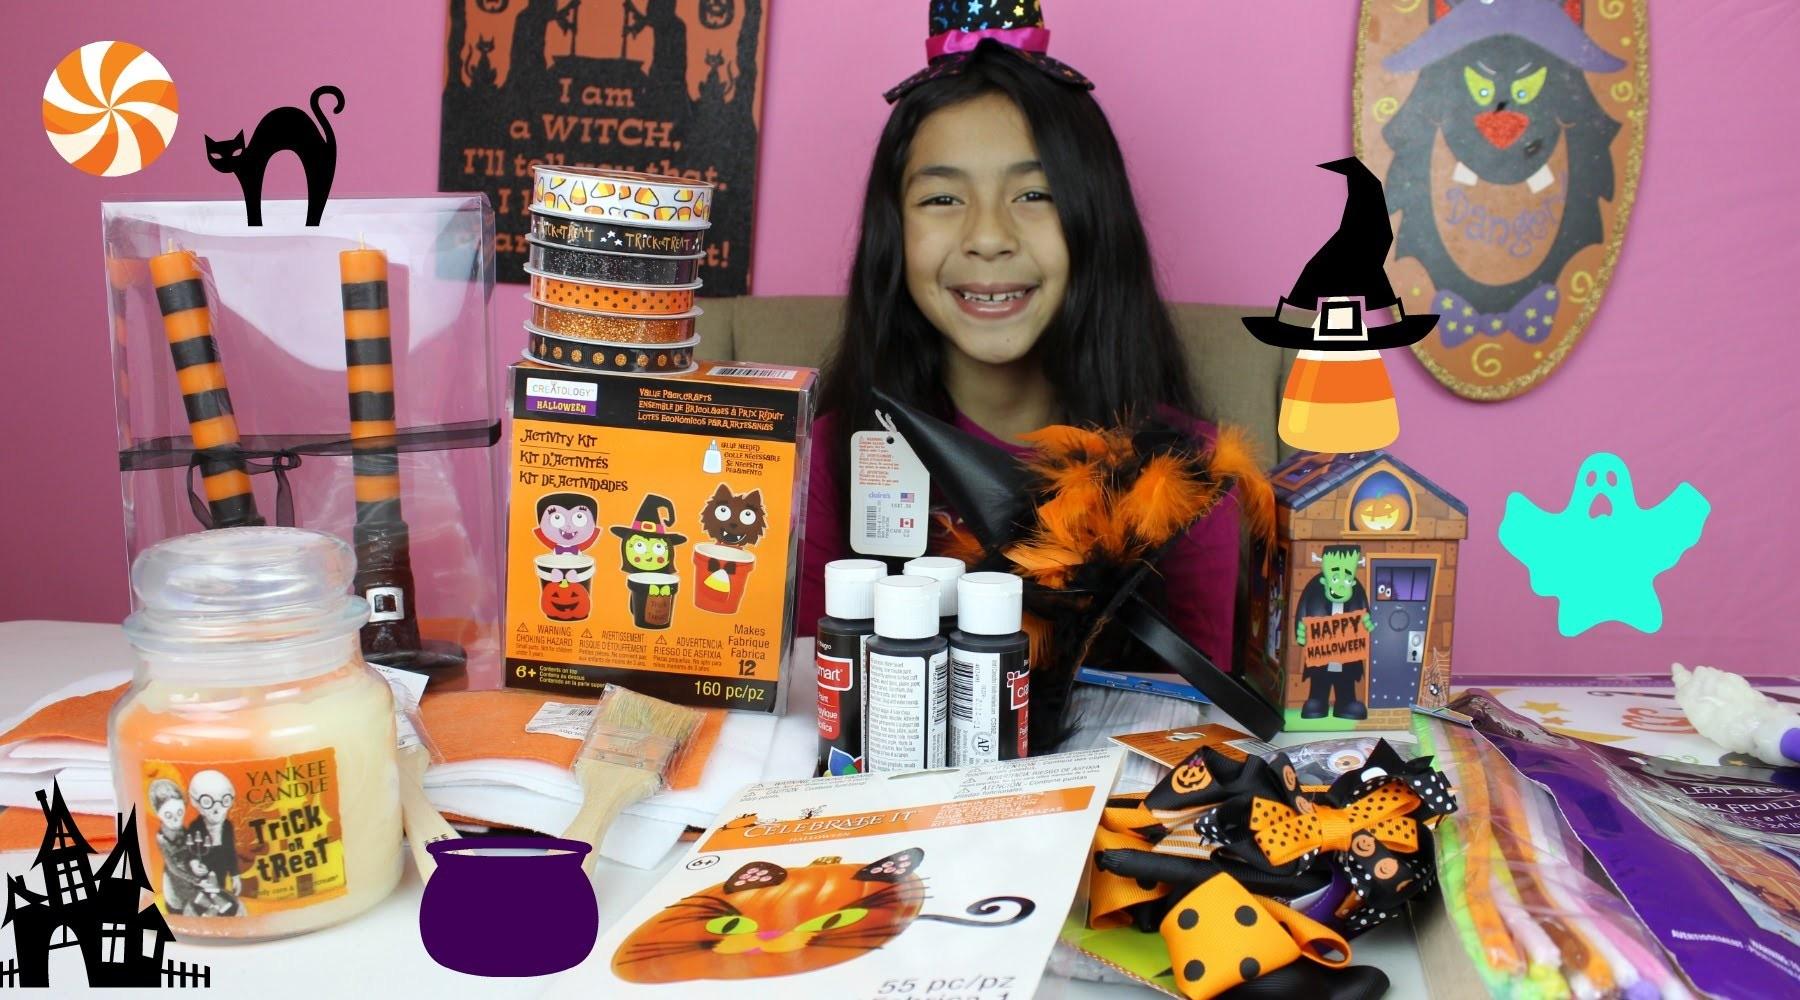 Halloween Haul | Halloween 2014|Accessories, Crafts,Decorations,Candles B2cutecupcakes